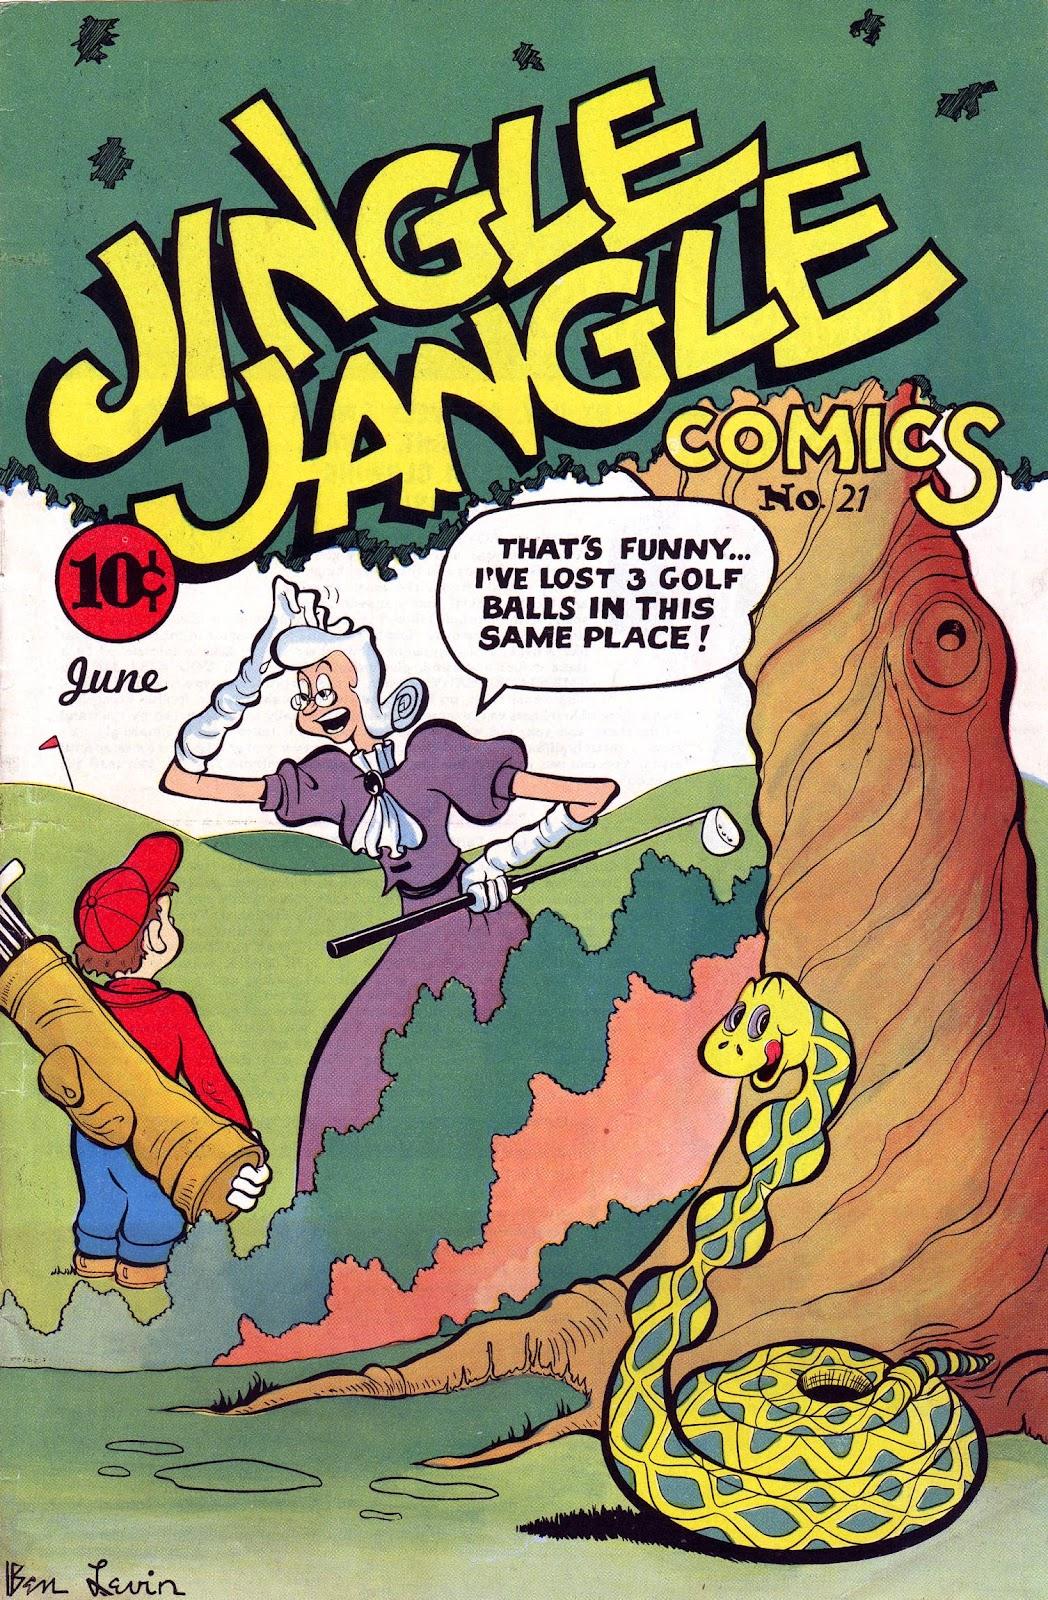 Jingle Jangle Comics issue 21 - Page 1